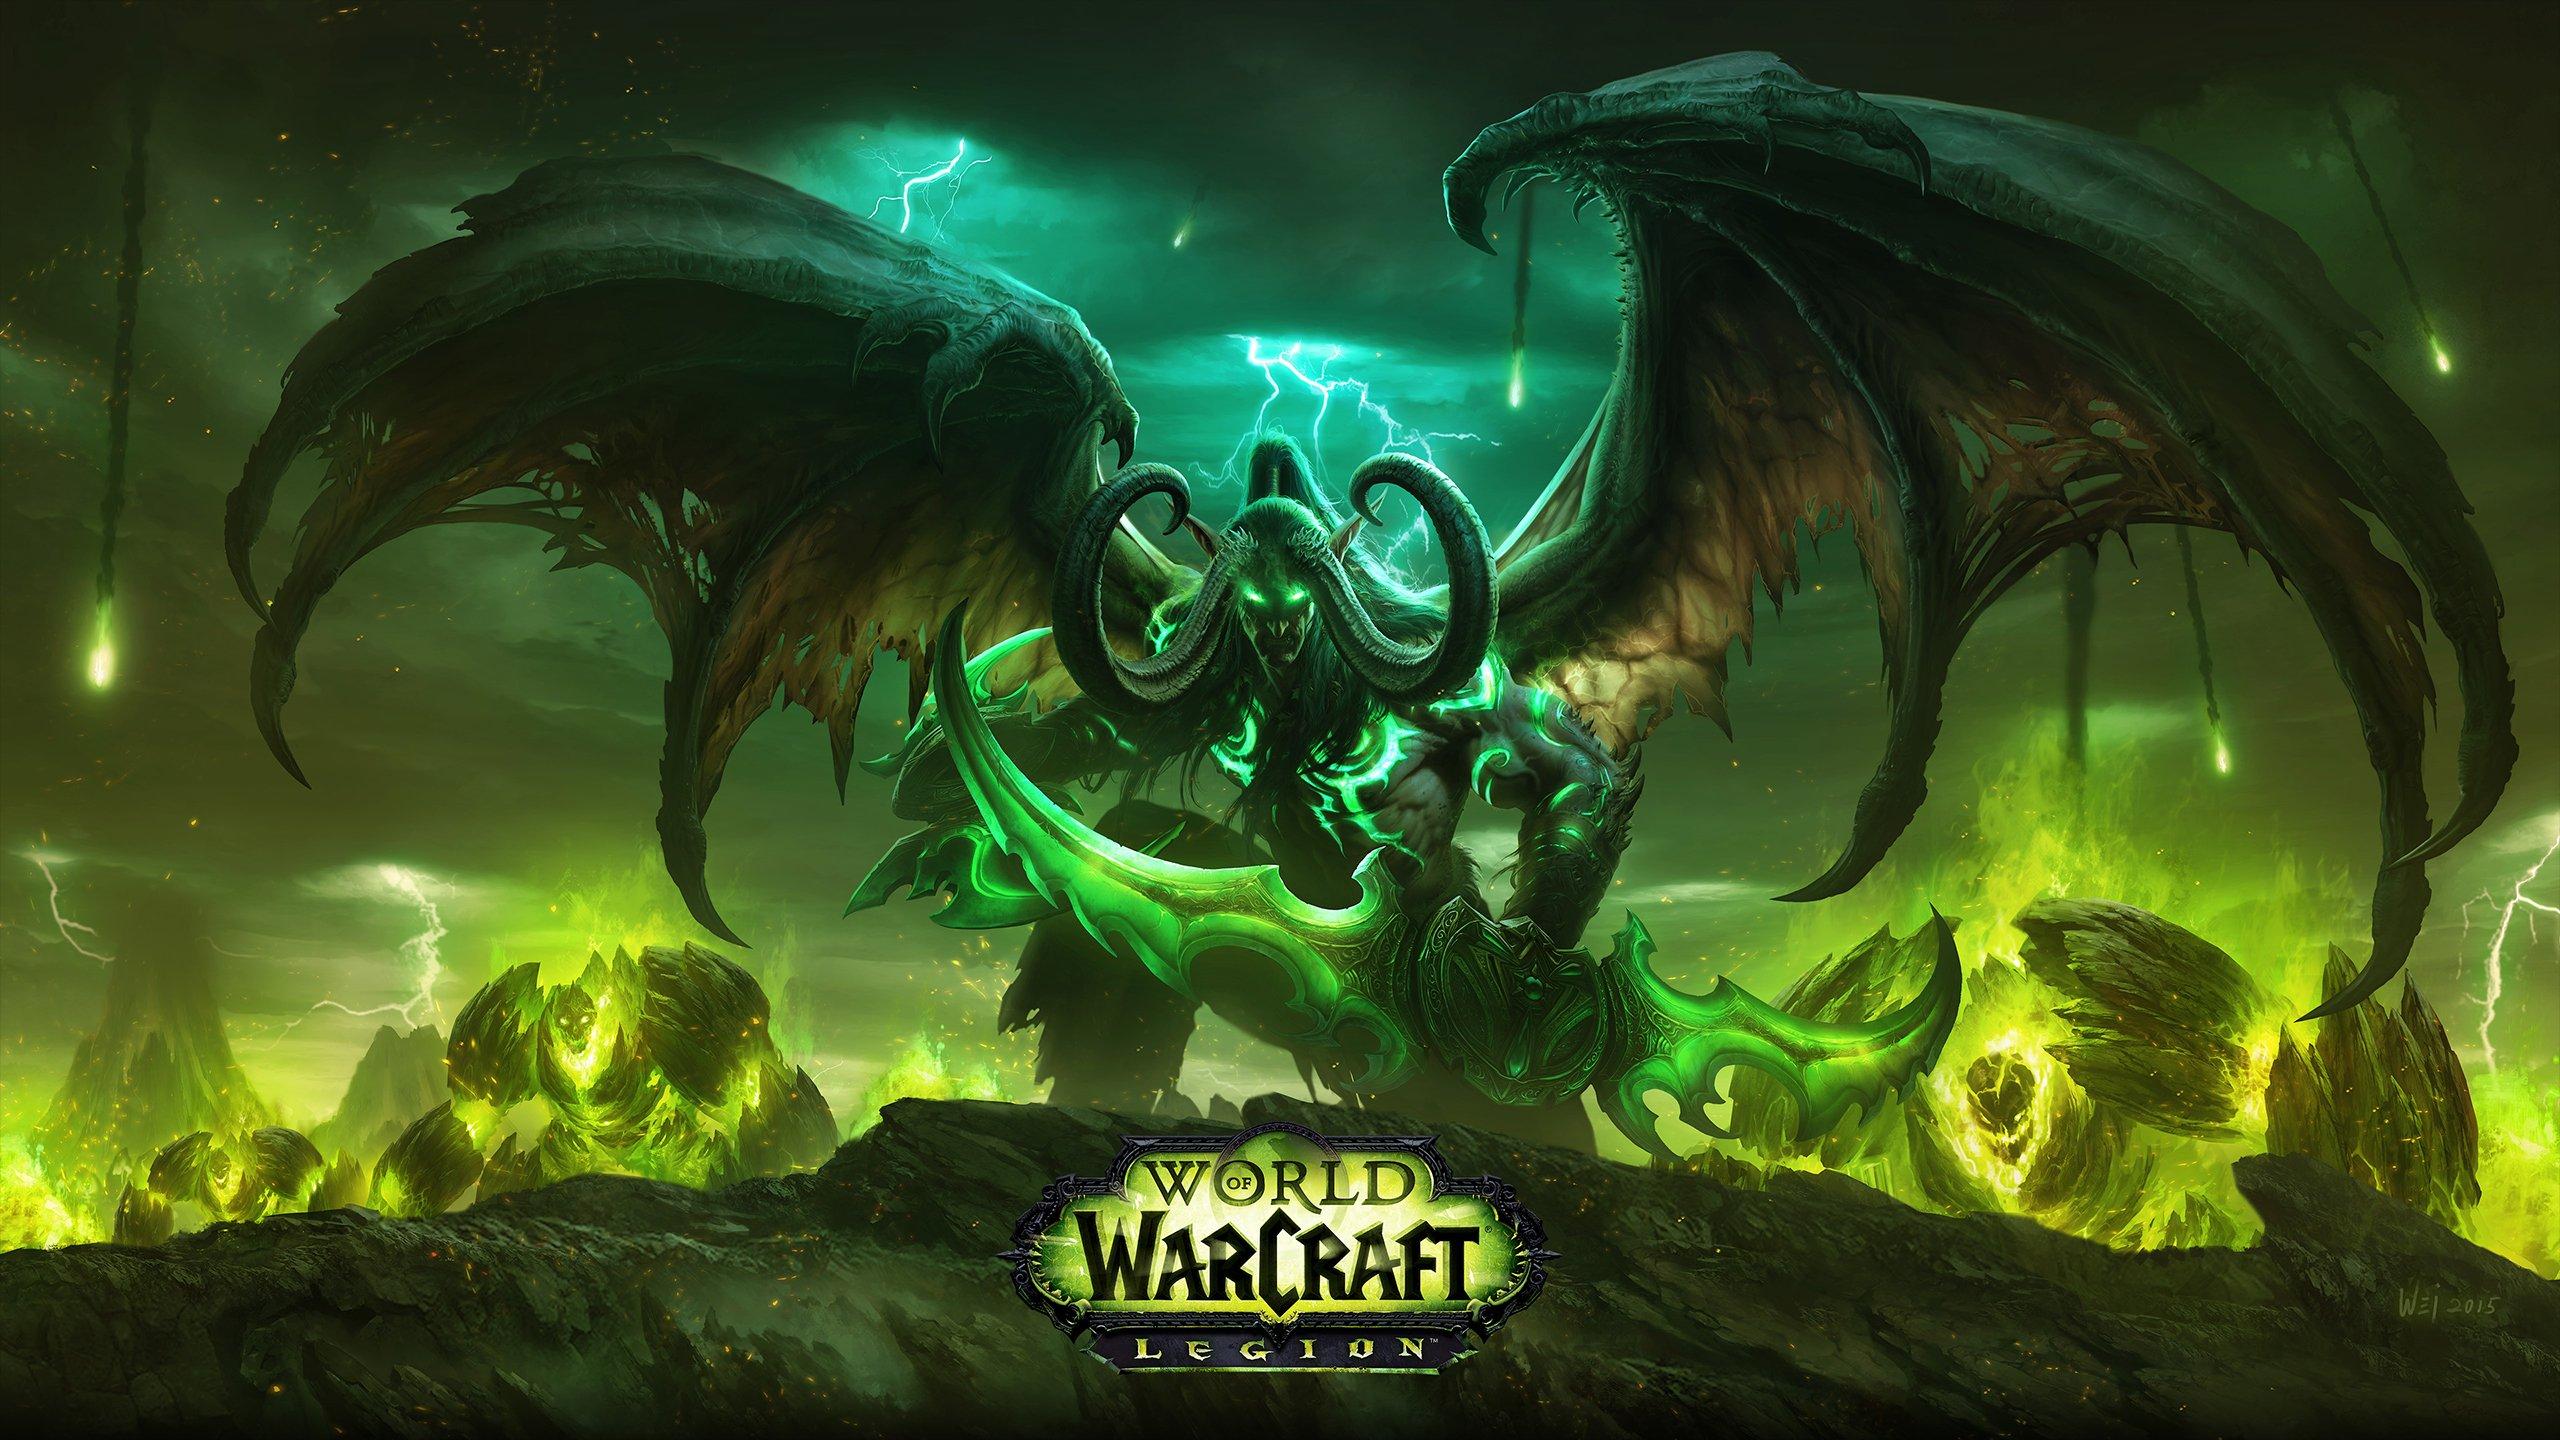 world of warcraft legion wallpaper